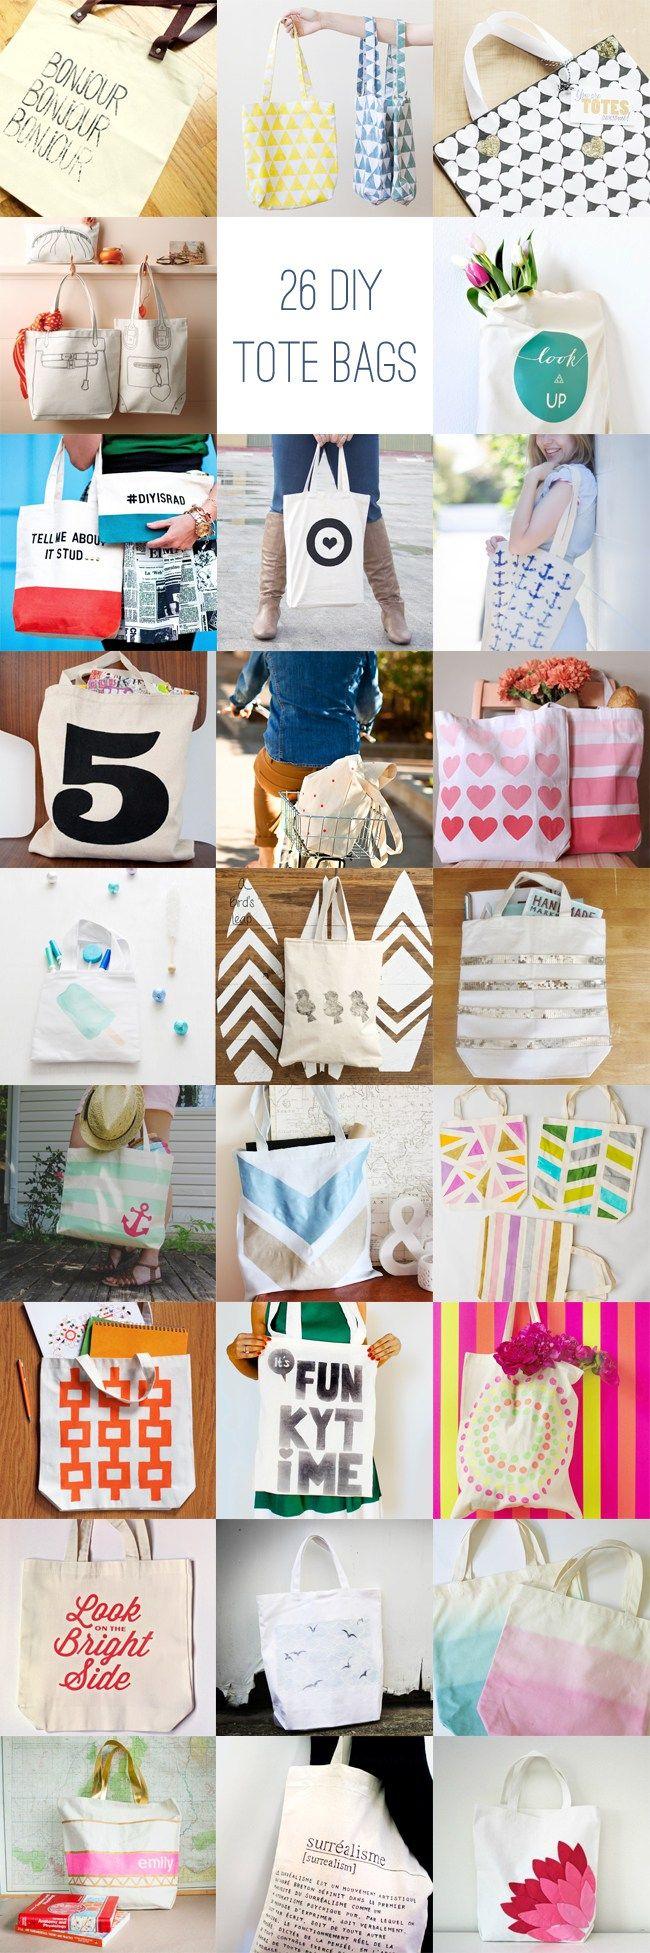 26 DIY Tote Bags   HelloGlow.co